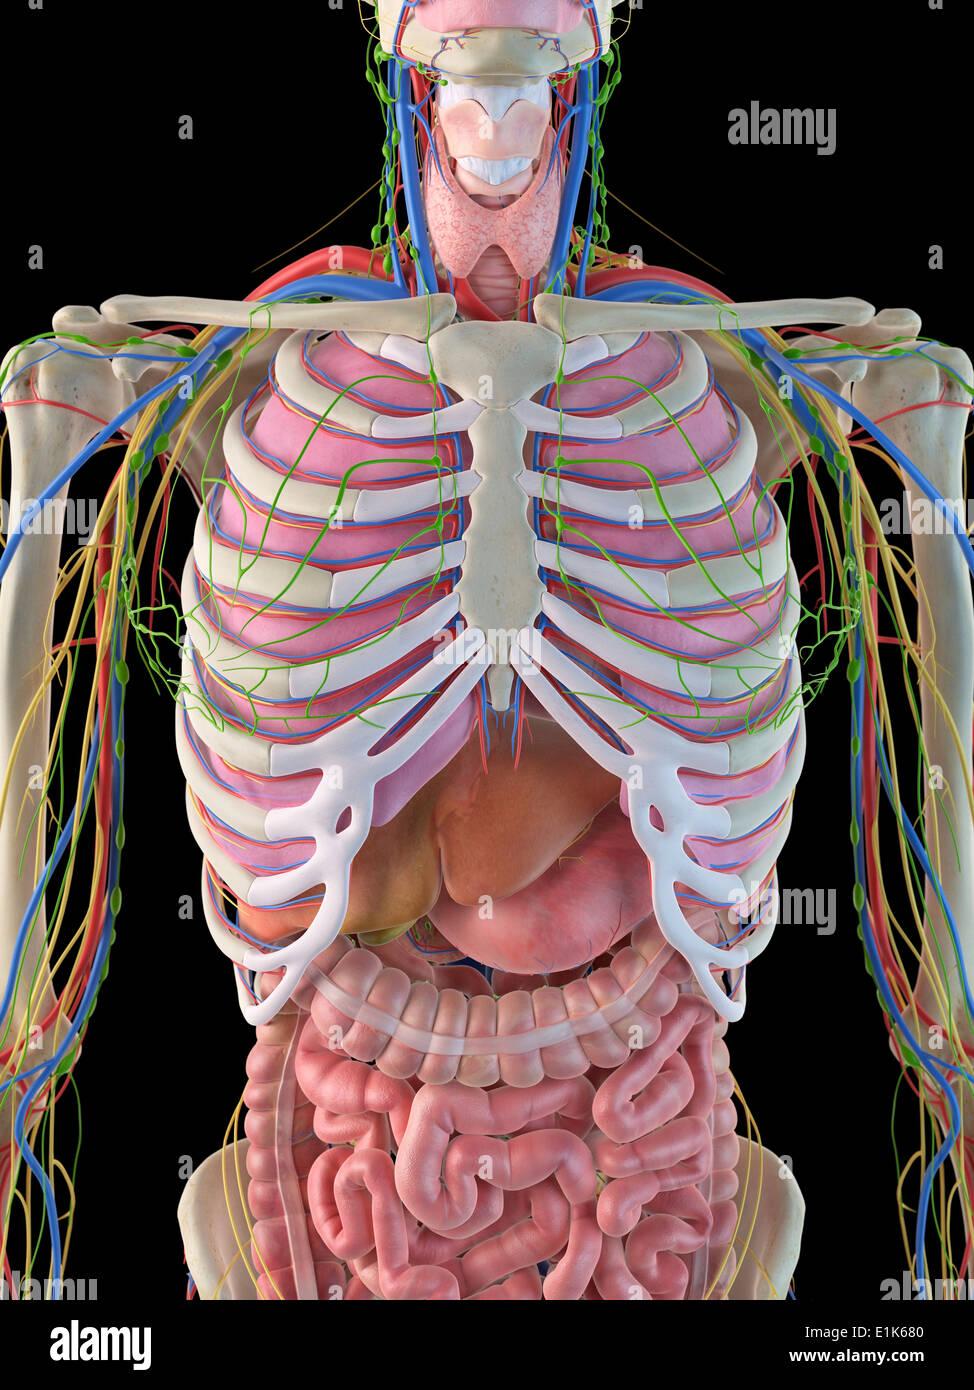 Human ribcage and internal organs computer artwork stock photo human ribcage and internal organs computer artwork ccuart Images